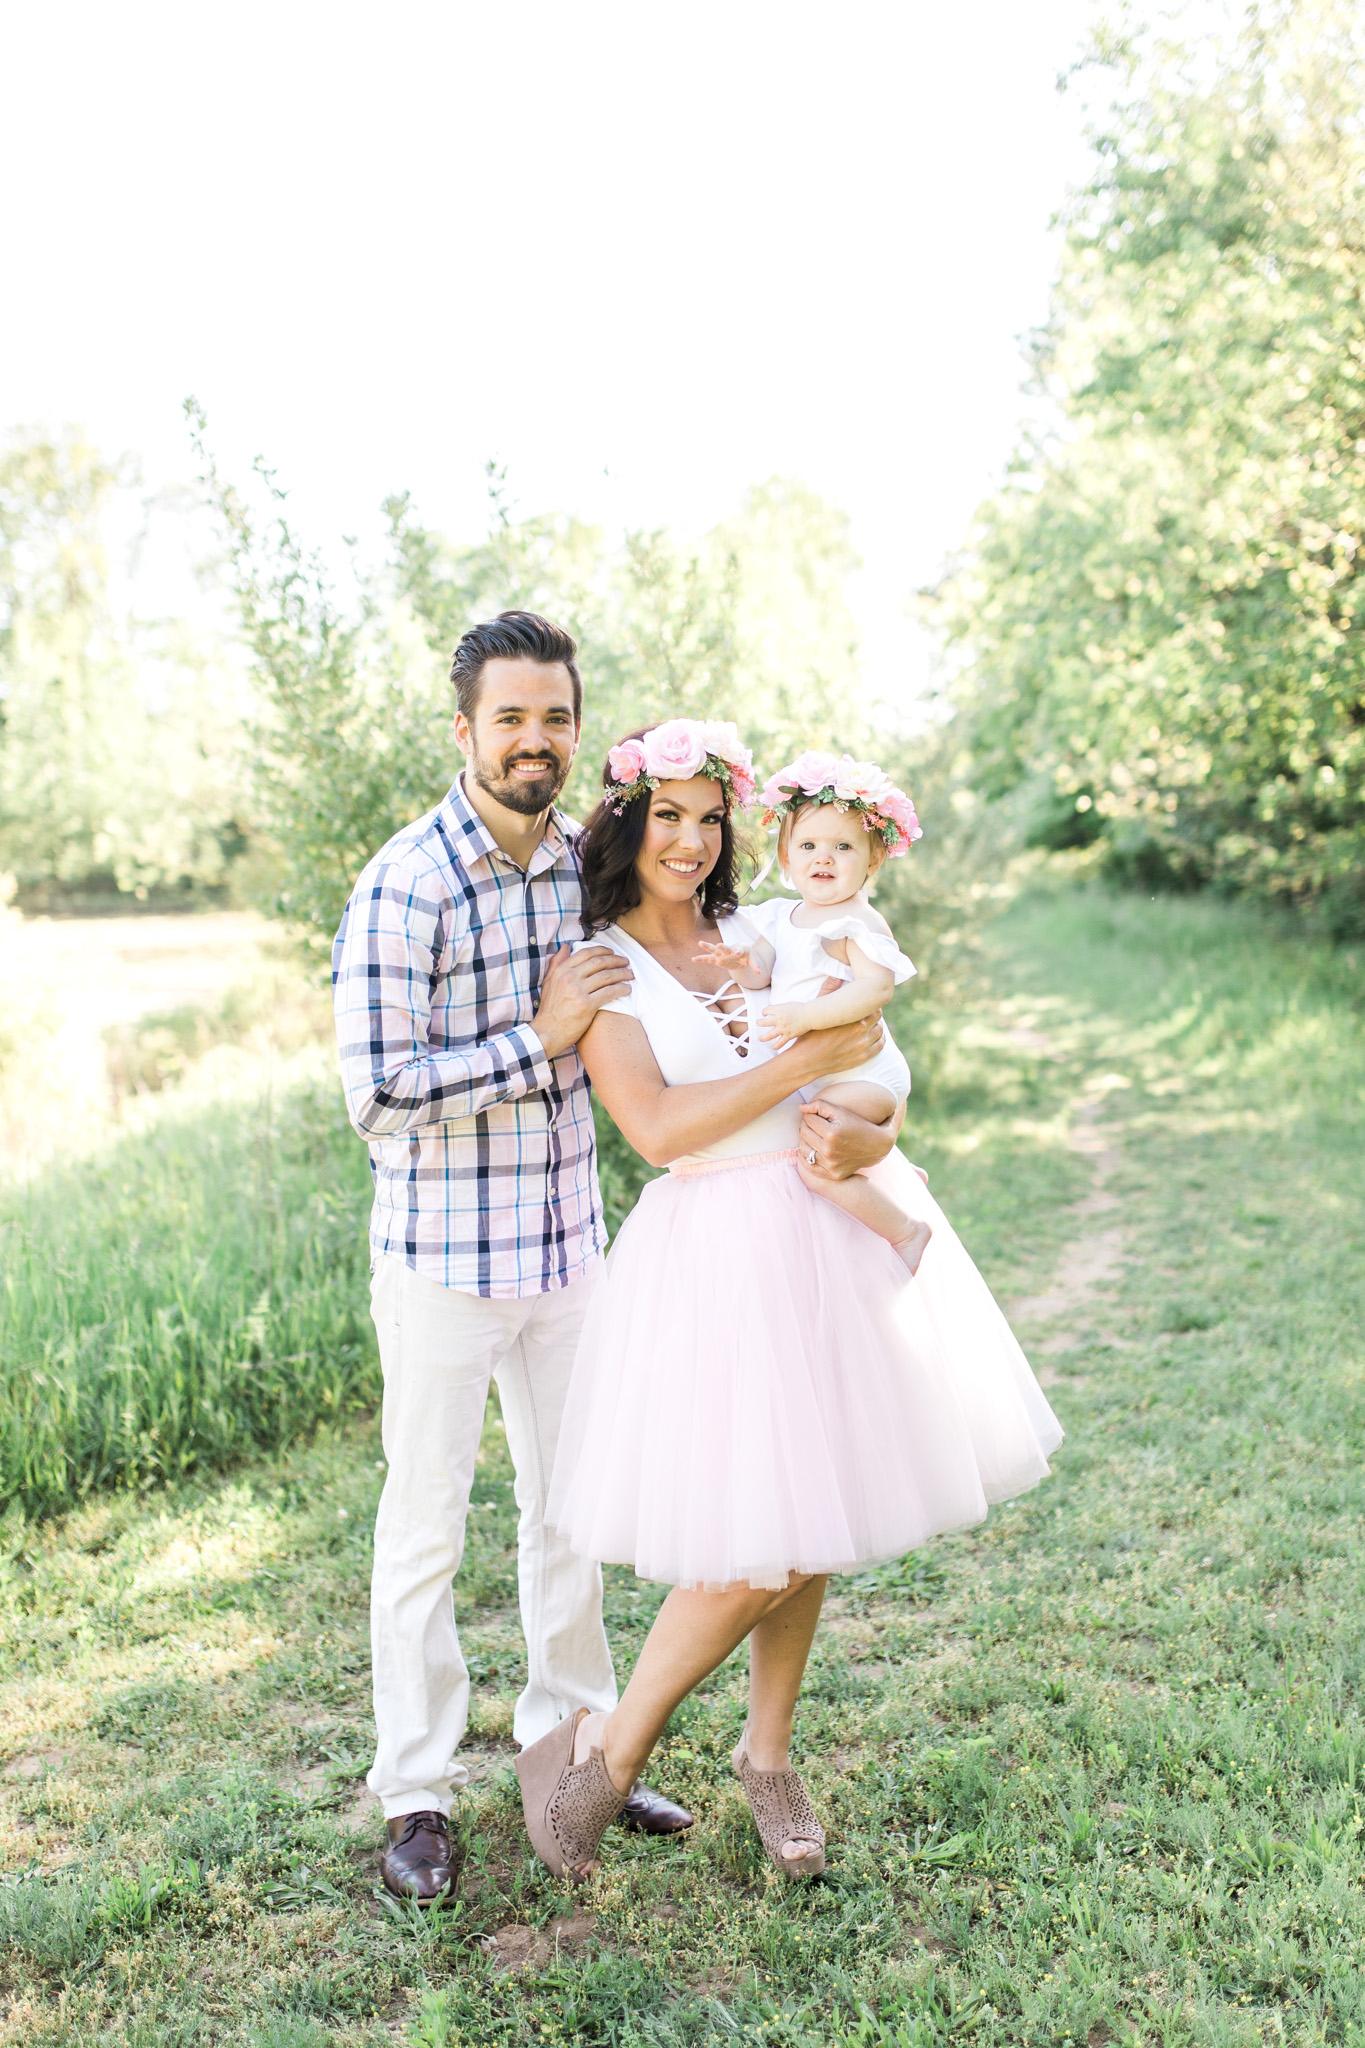 First Birthday Photos   Baby girl   Pink tutu   Cake Smash   Family Photos   What to Wear   Intersex Variation